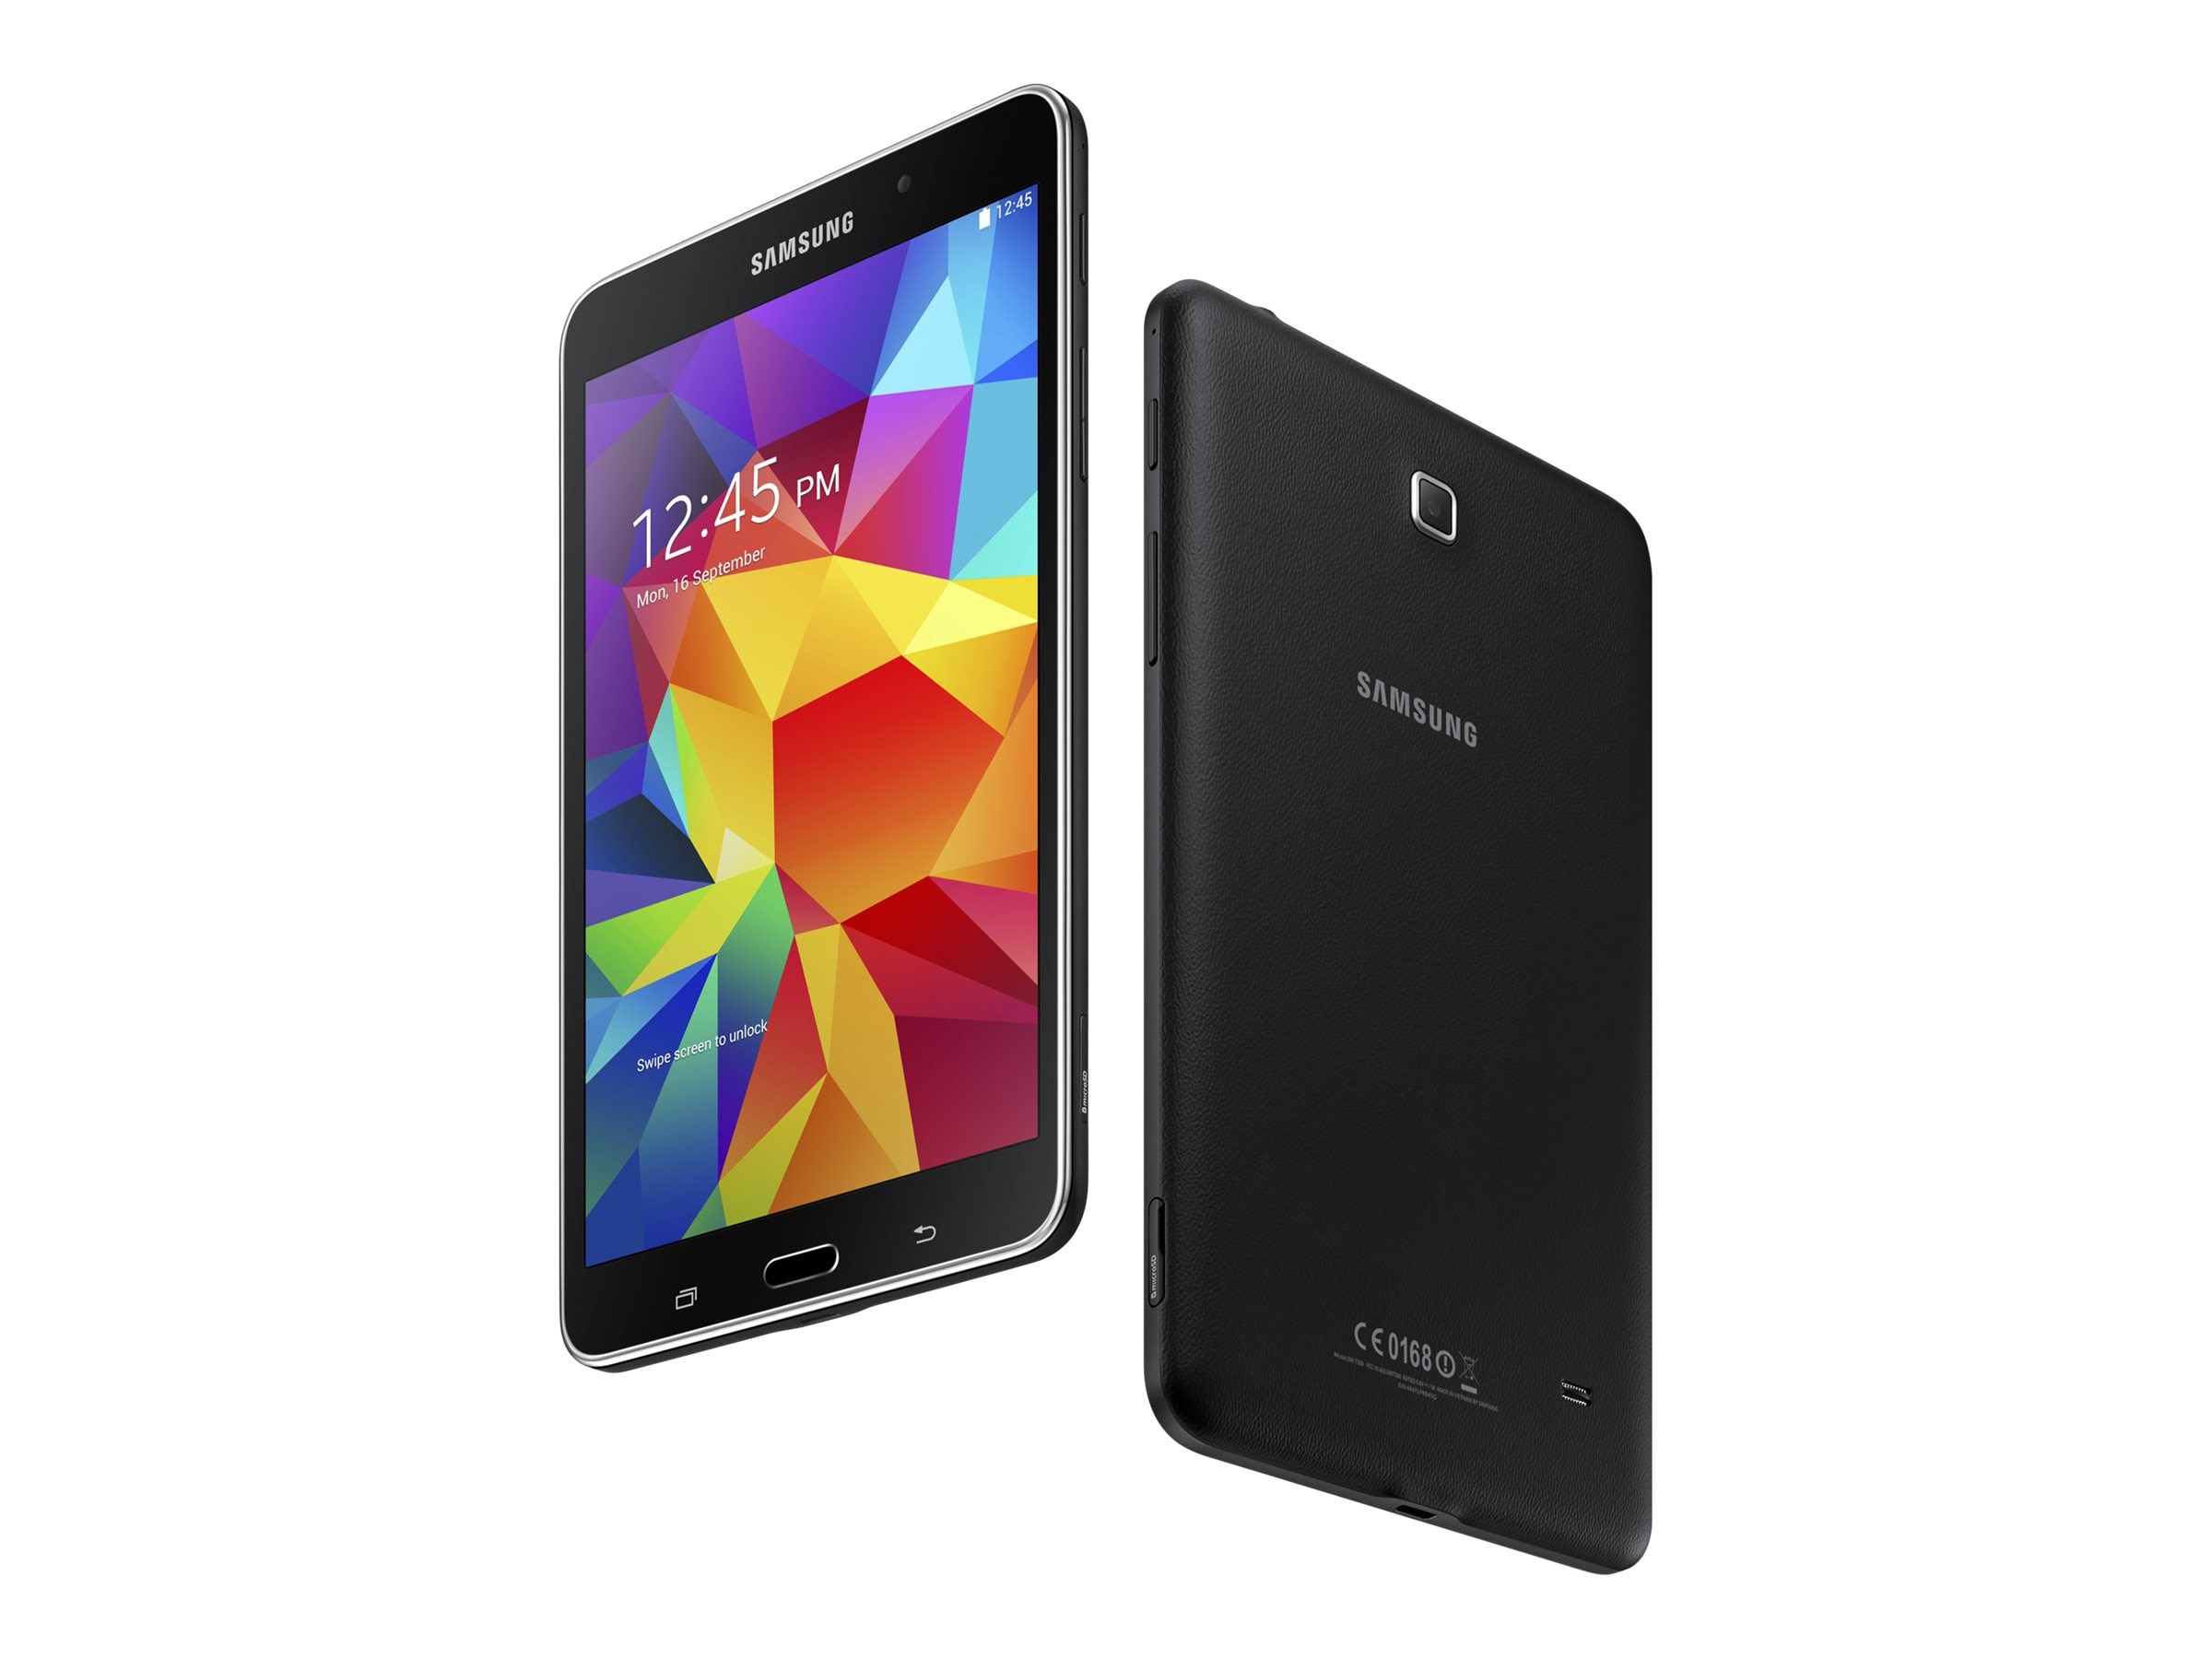 Samsung SM-T230NYKAXAR Image 5